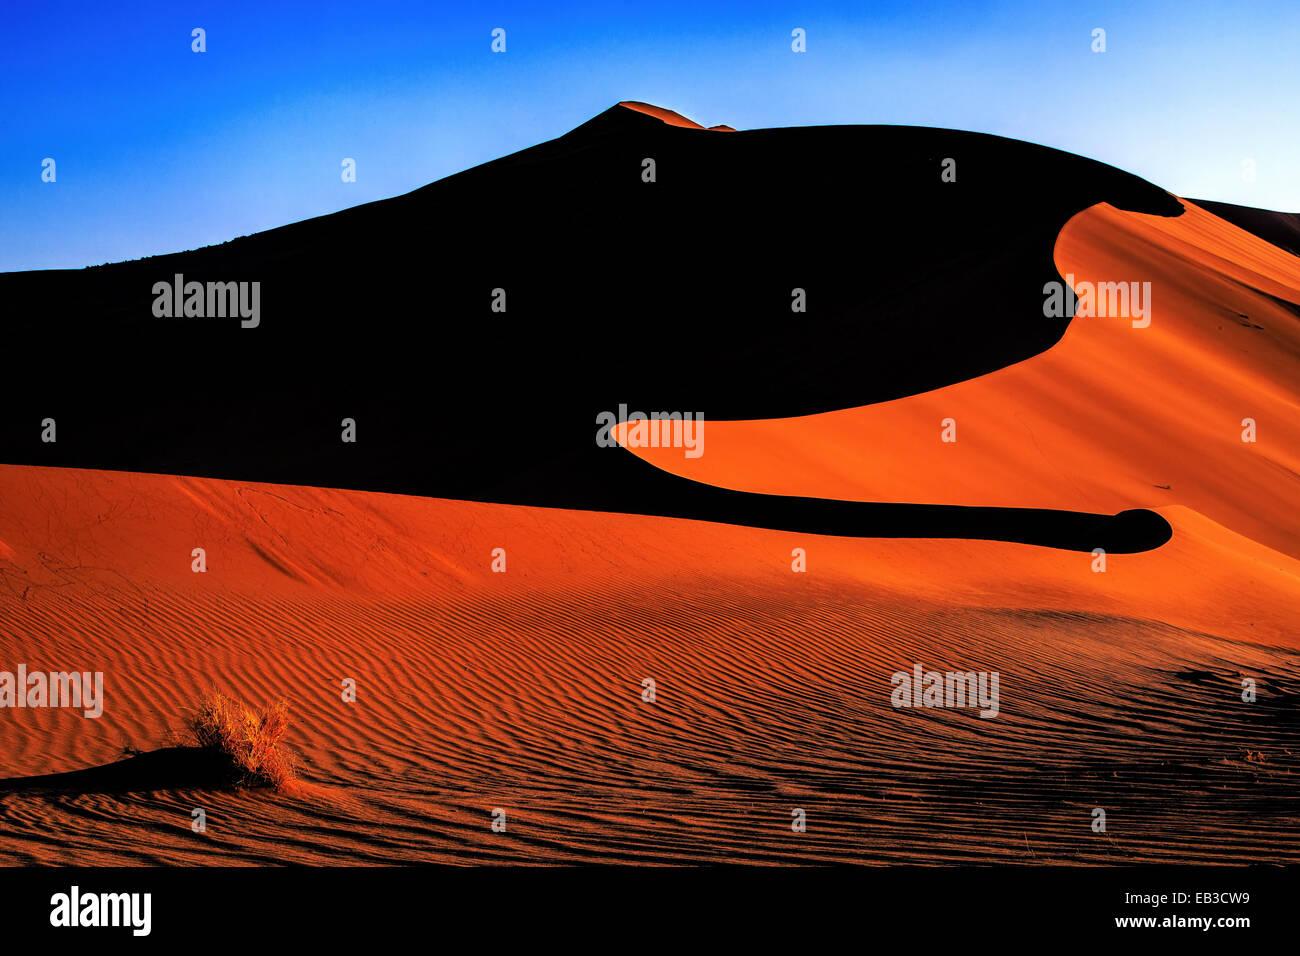 Namibia, Sand dunes of Sossuslvlei - Stock Image